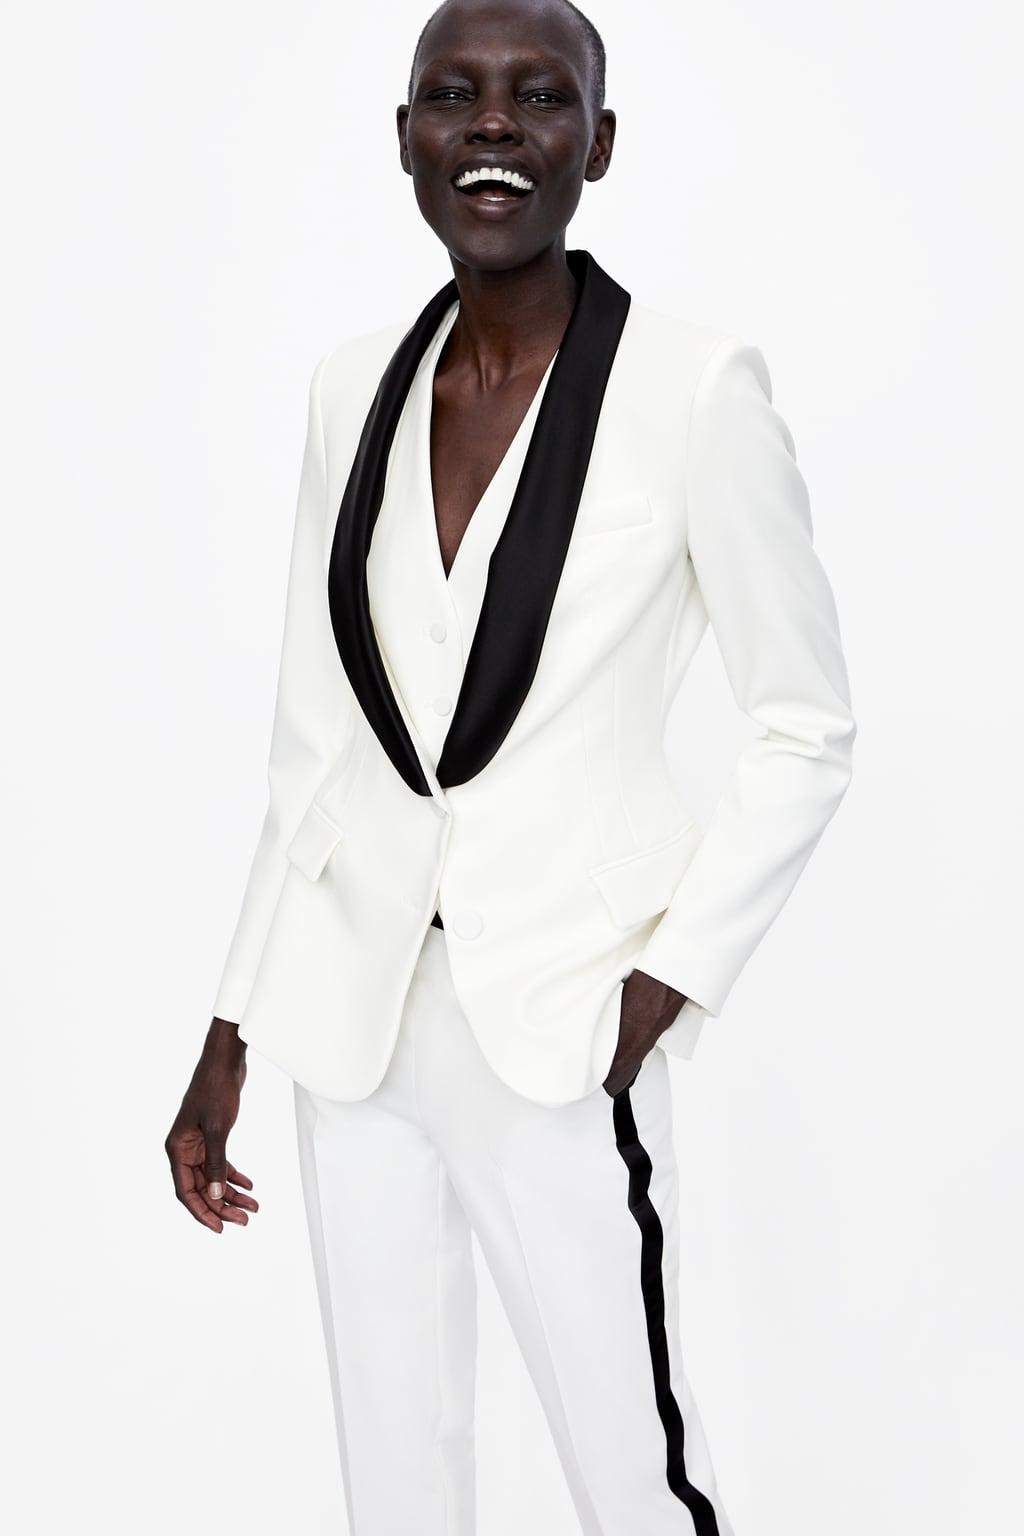 https://ufonomore.com/recently-added/zara-contrasting-tuxedo-jacket-in-white